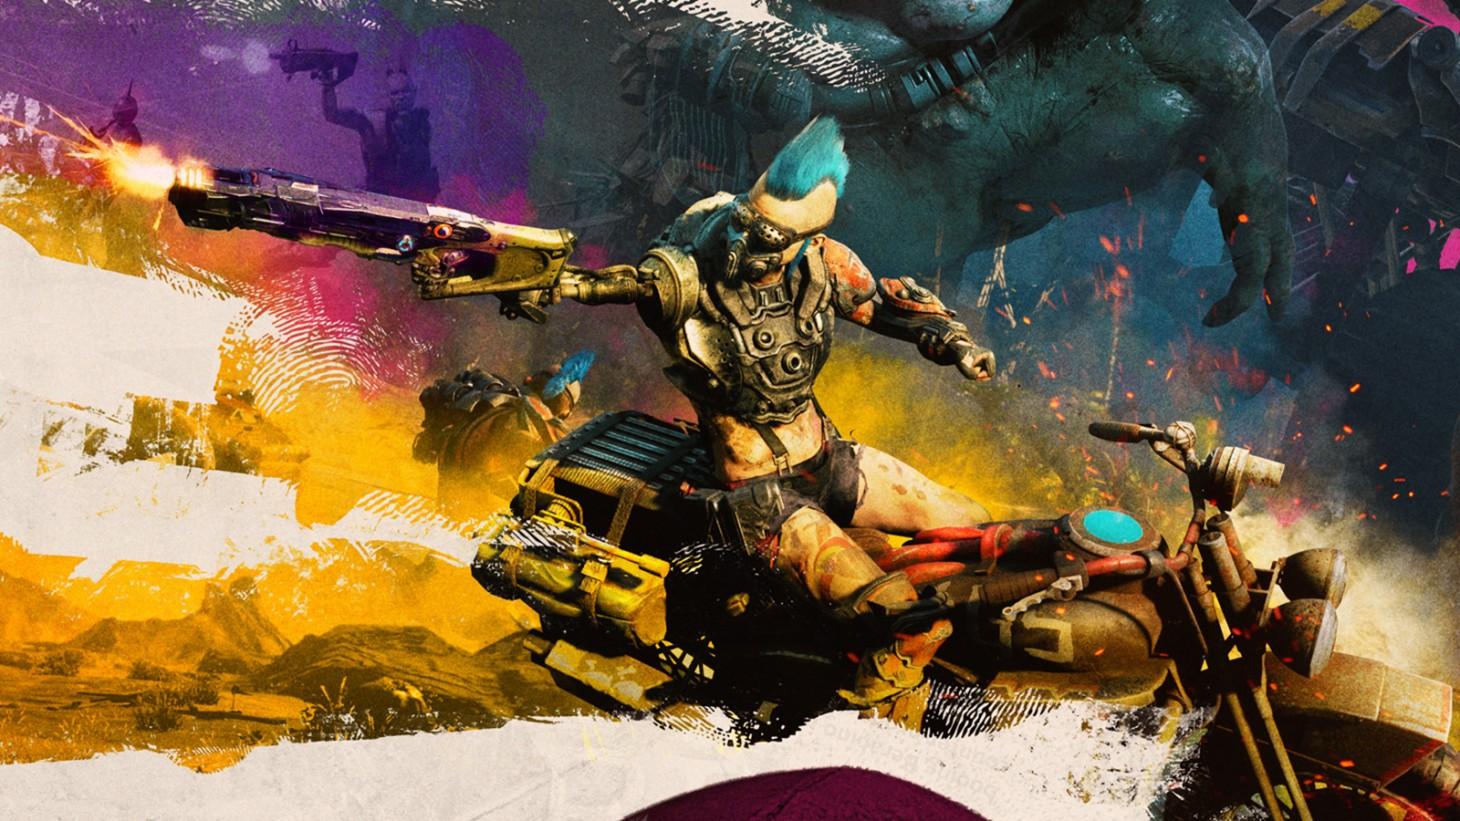 Rage 2 launches on May 14, still looks like insane fun screenshot